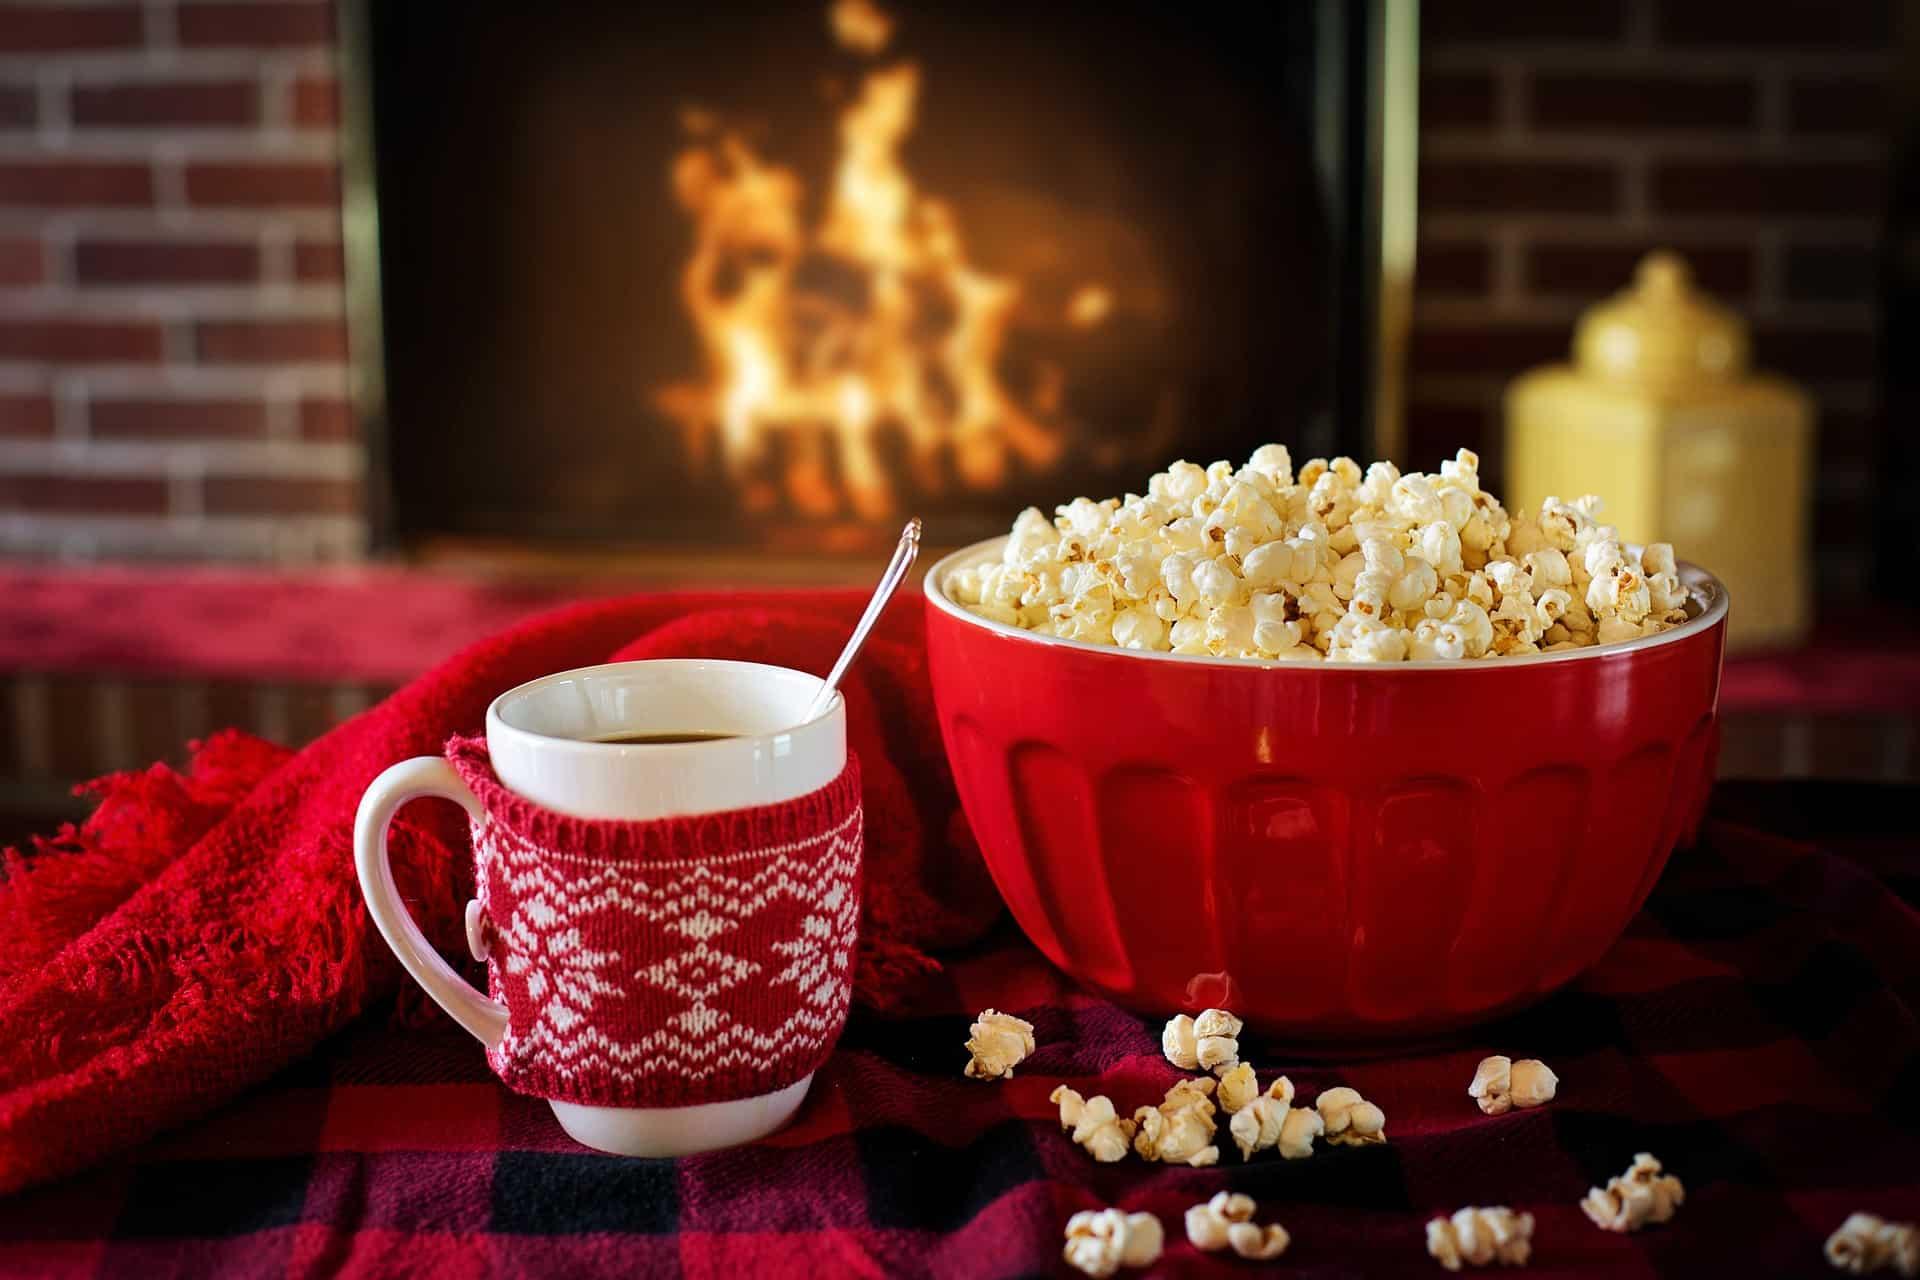 Energy saving tips for over the festive season